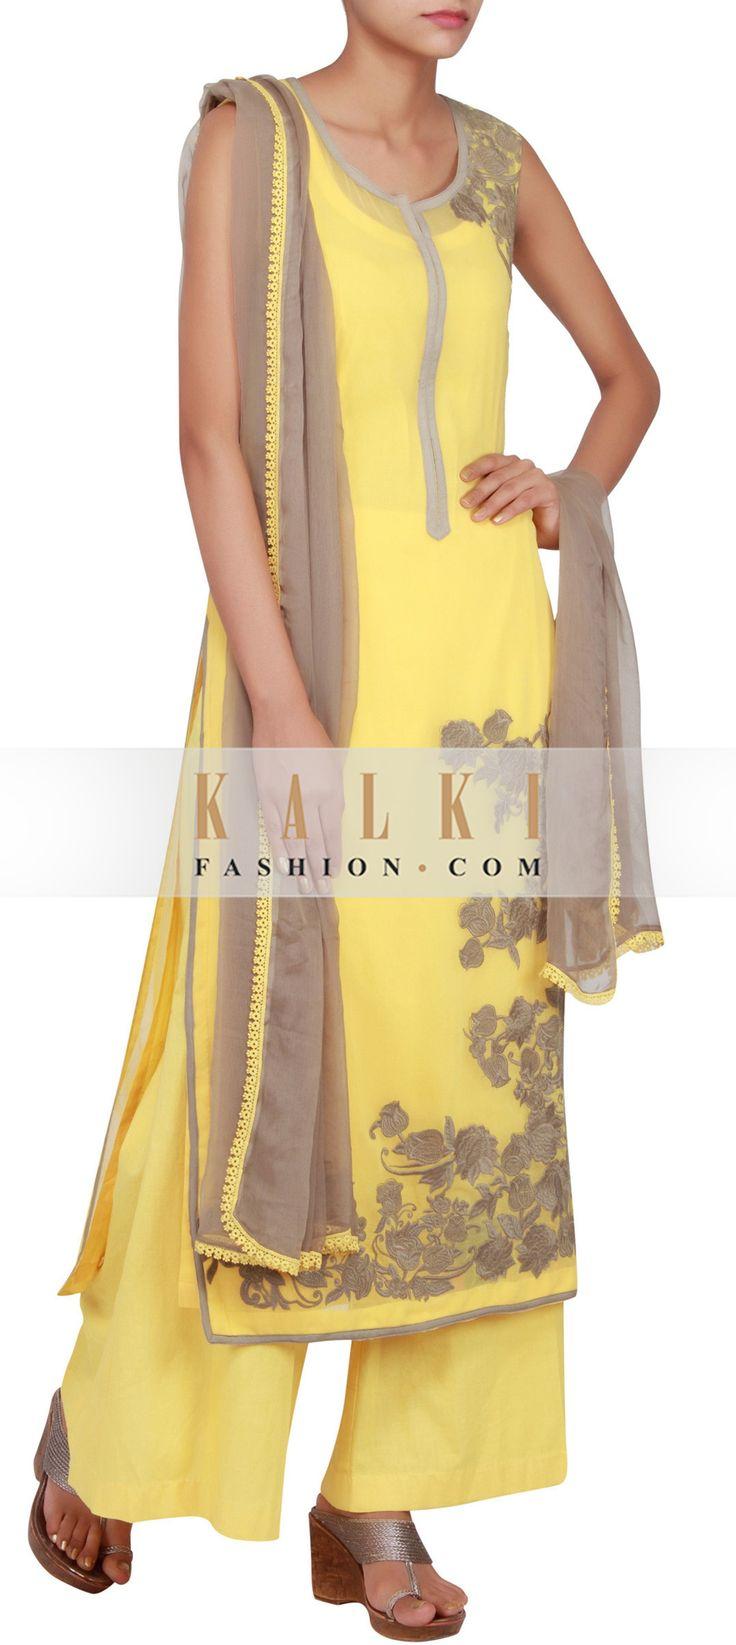 Get this beautiful Salwar-Kameez http://www.kalkifashion.com/yellow-georgette-straight-cut-salwar-kameez-embellished-in-thread-work-only-on-kalki.html